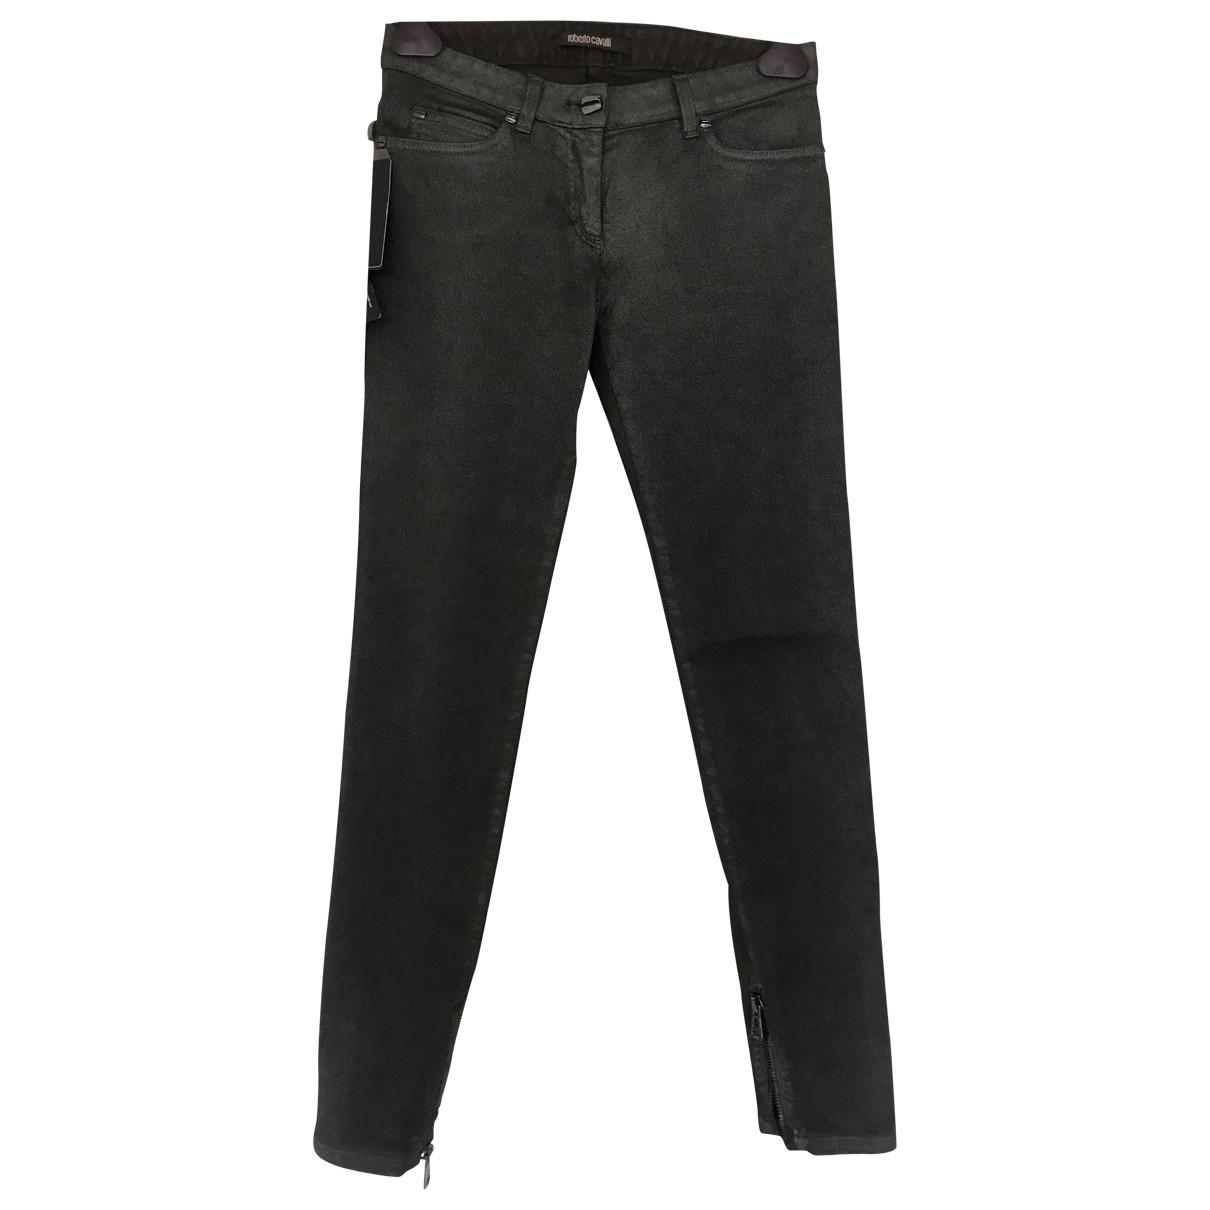 Roberto Cavalli \N Grey Denim - Jeans Trousers for Women 38 IT